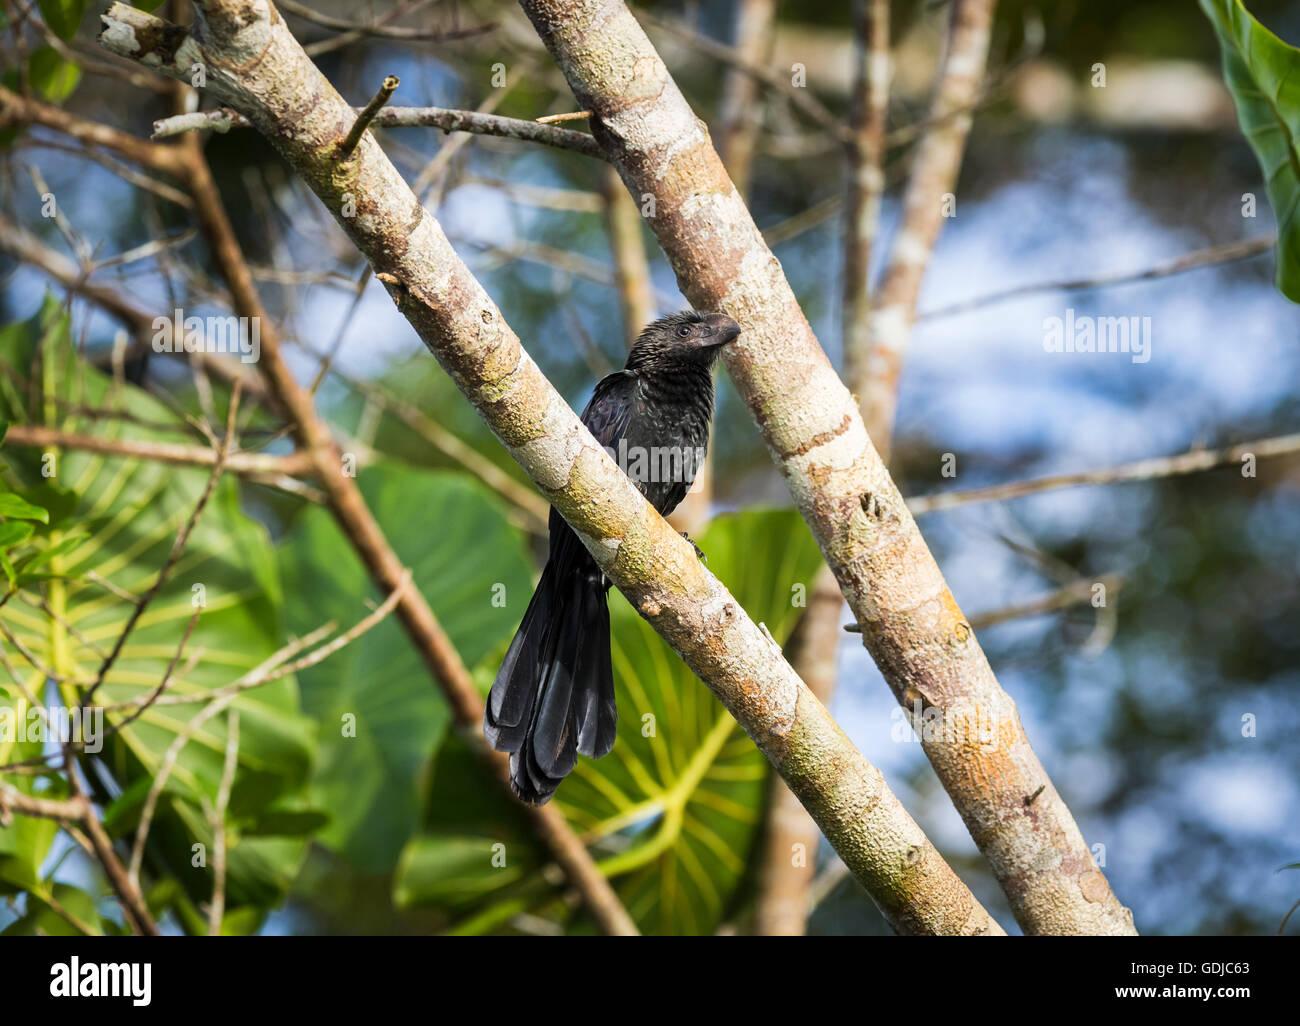 Smooth-billed ani (Crotophaga ani), Amazonian tropical rain forest at La Selva lodge on the Napo River, Ecuador, - Stock Image